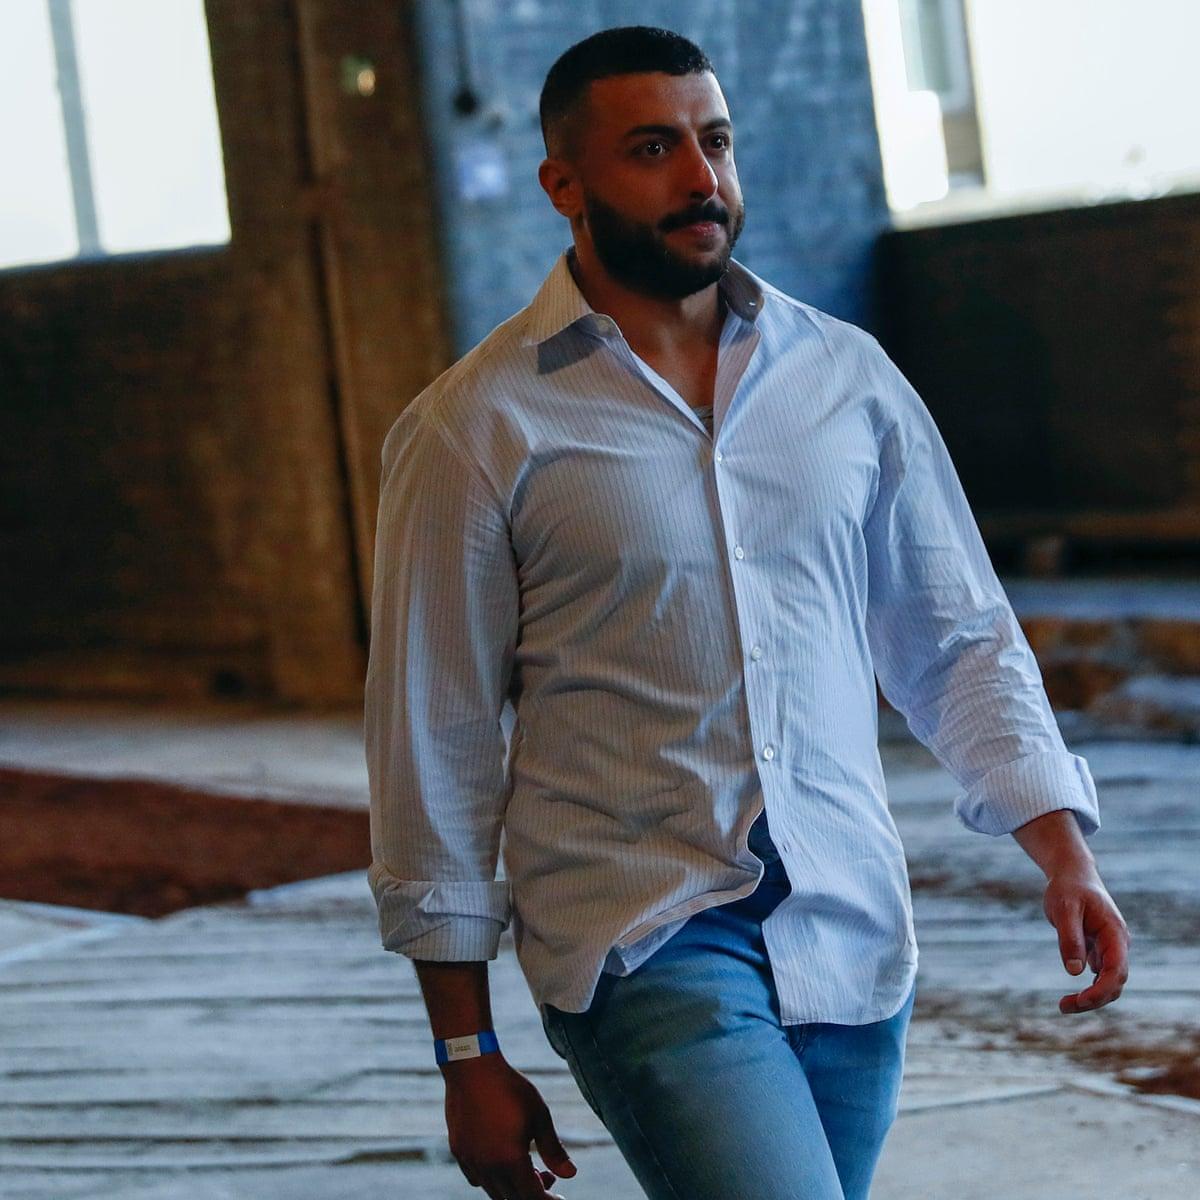 Khalid Al Qasimi Uae Sheikh And Fashion Designer Dies Aged 39 Fashion The Guardian